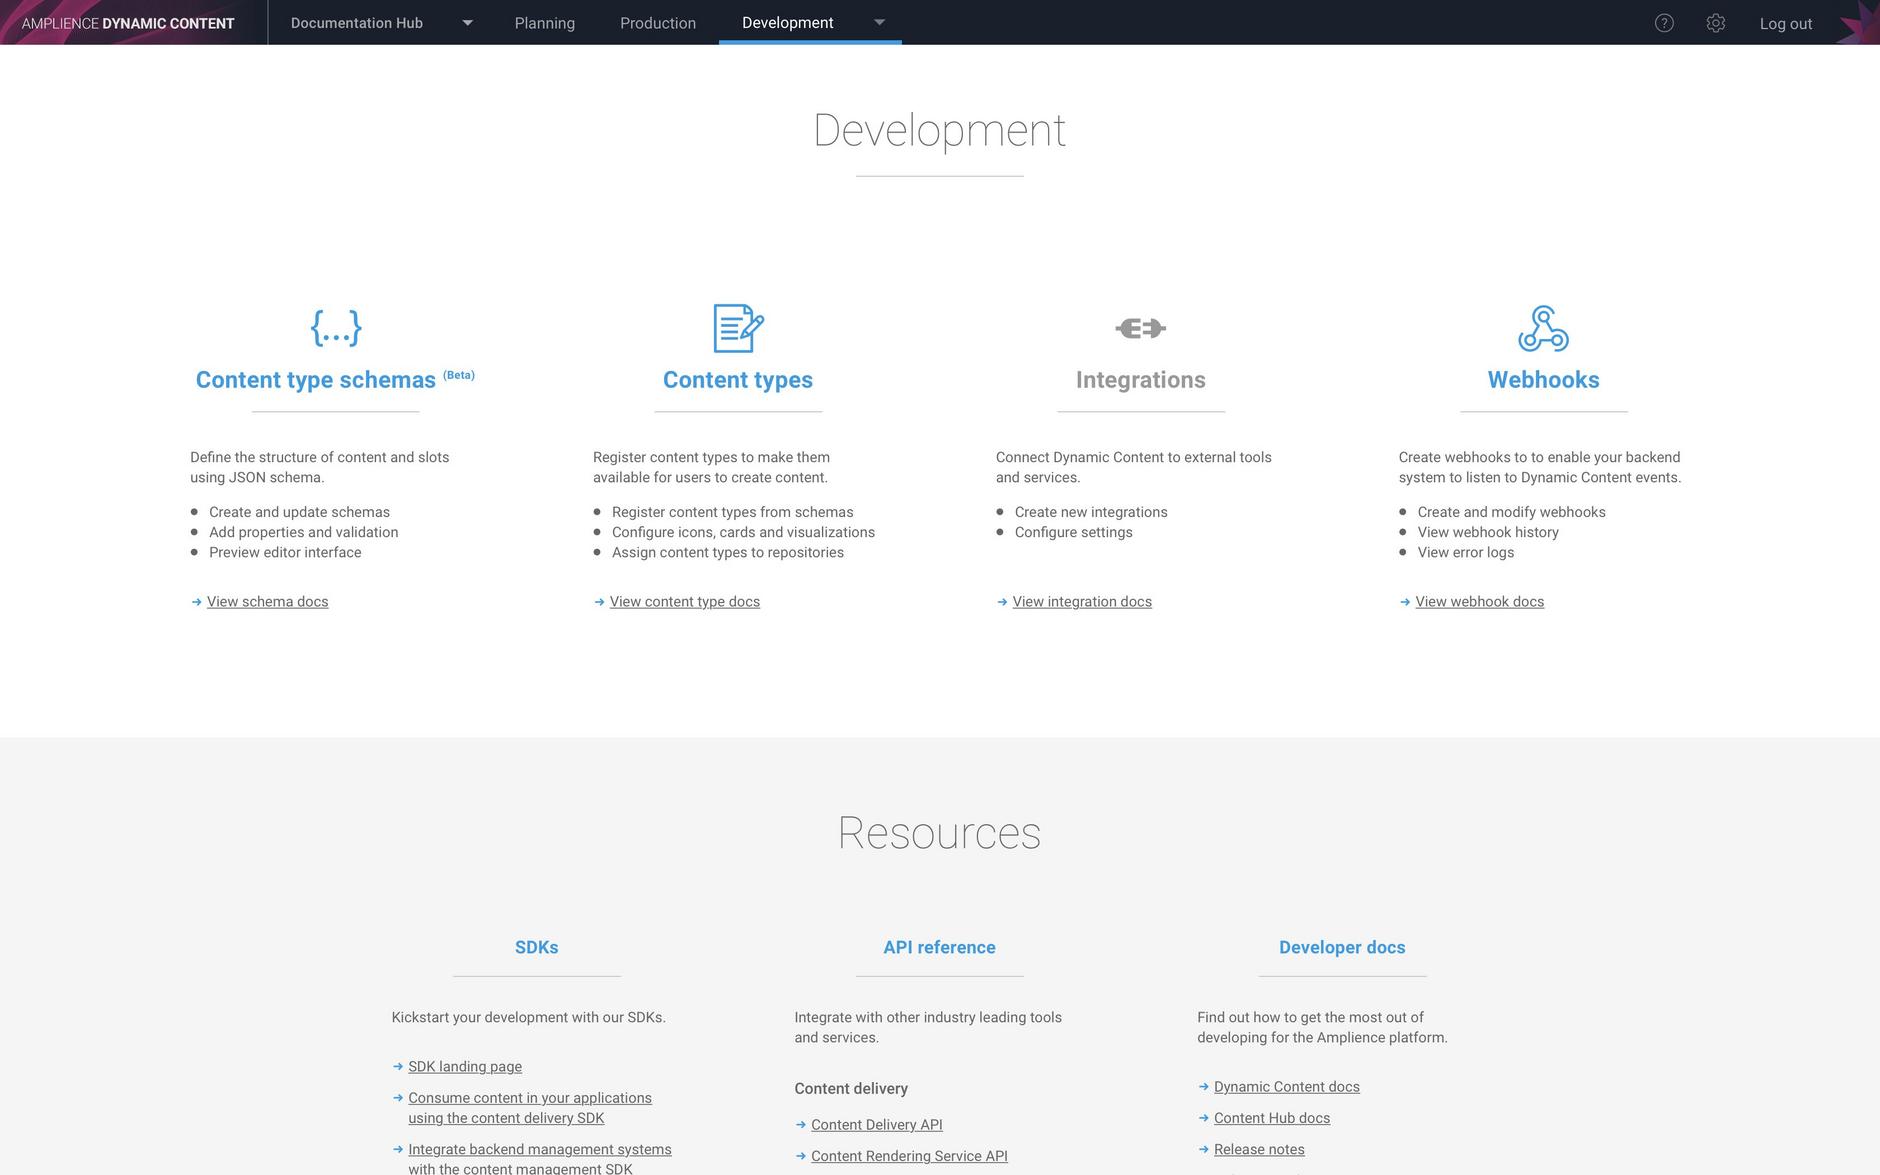 The development landing page